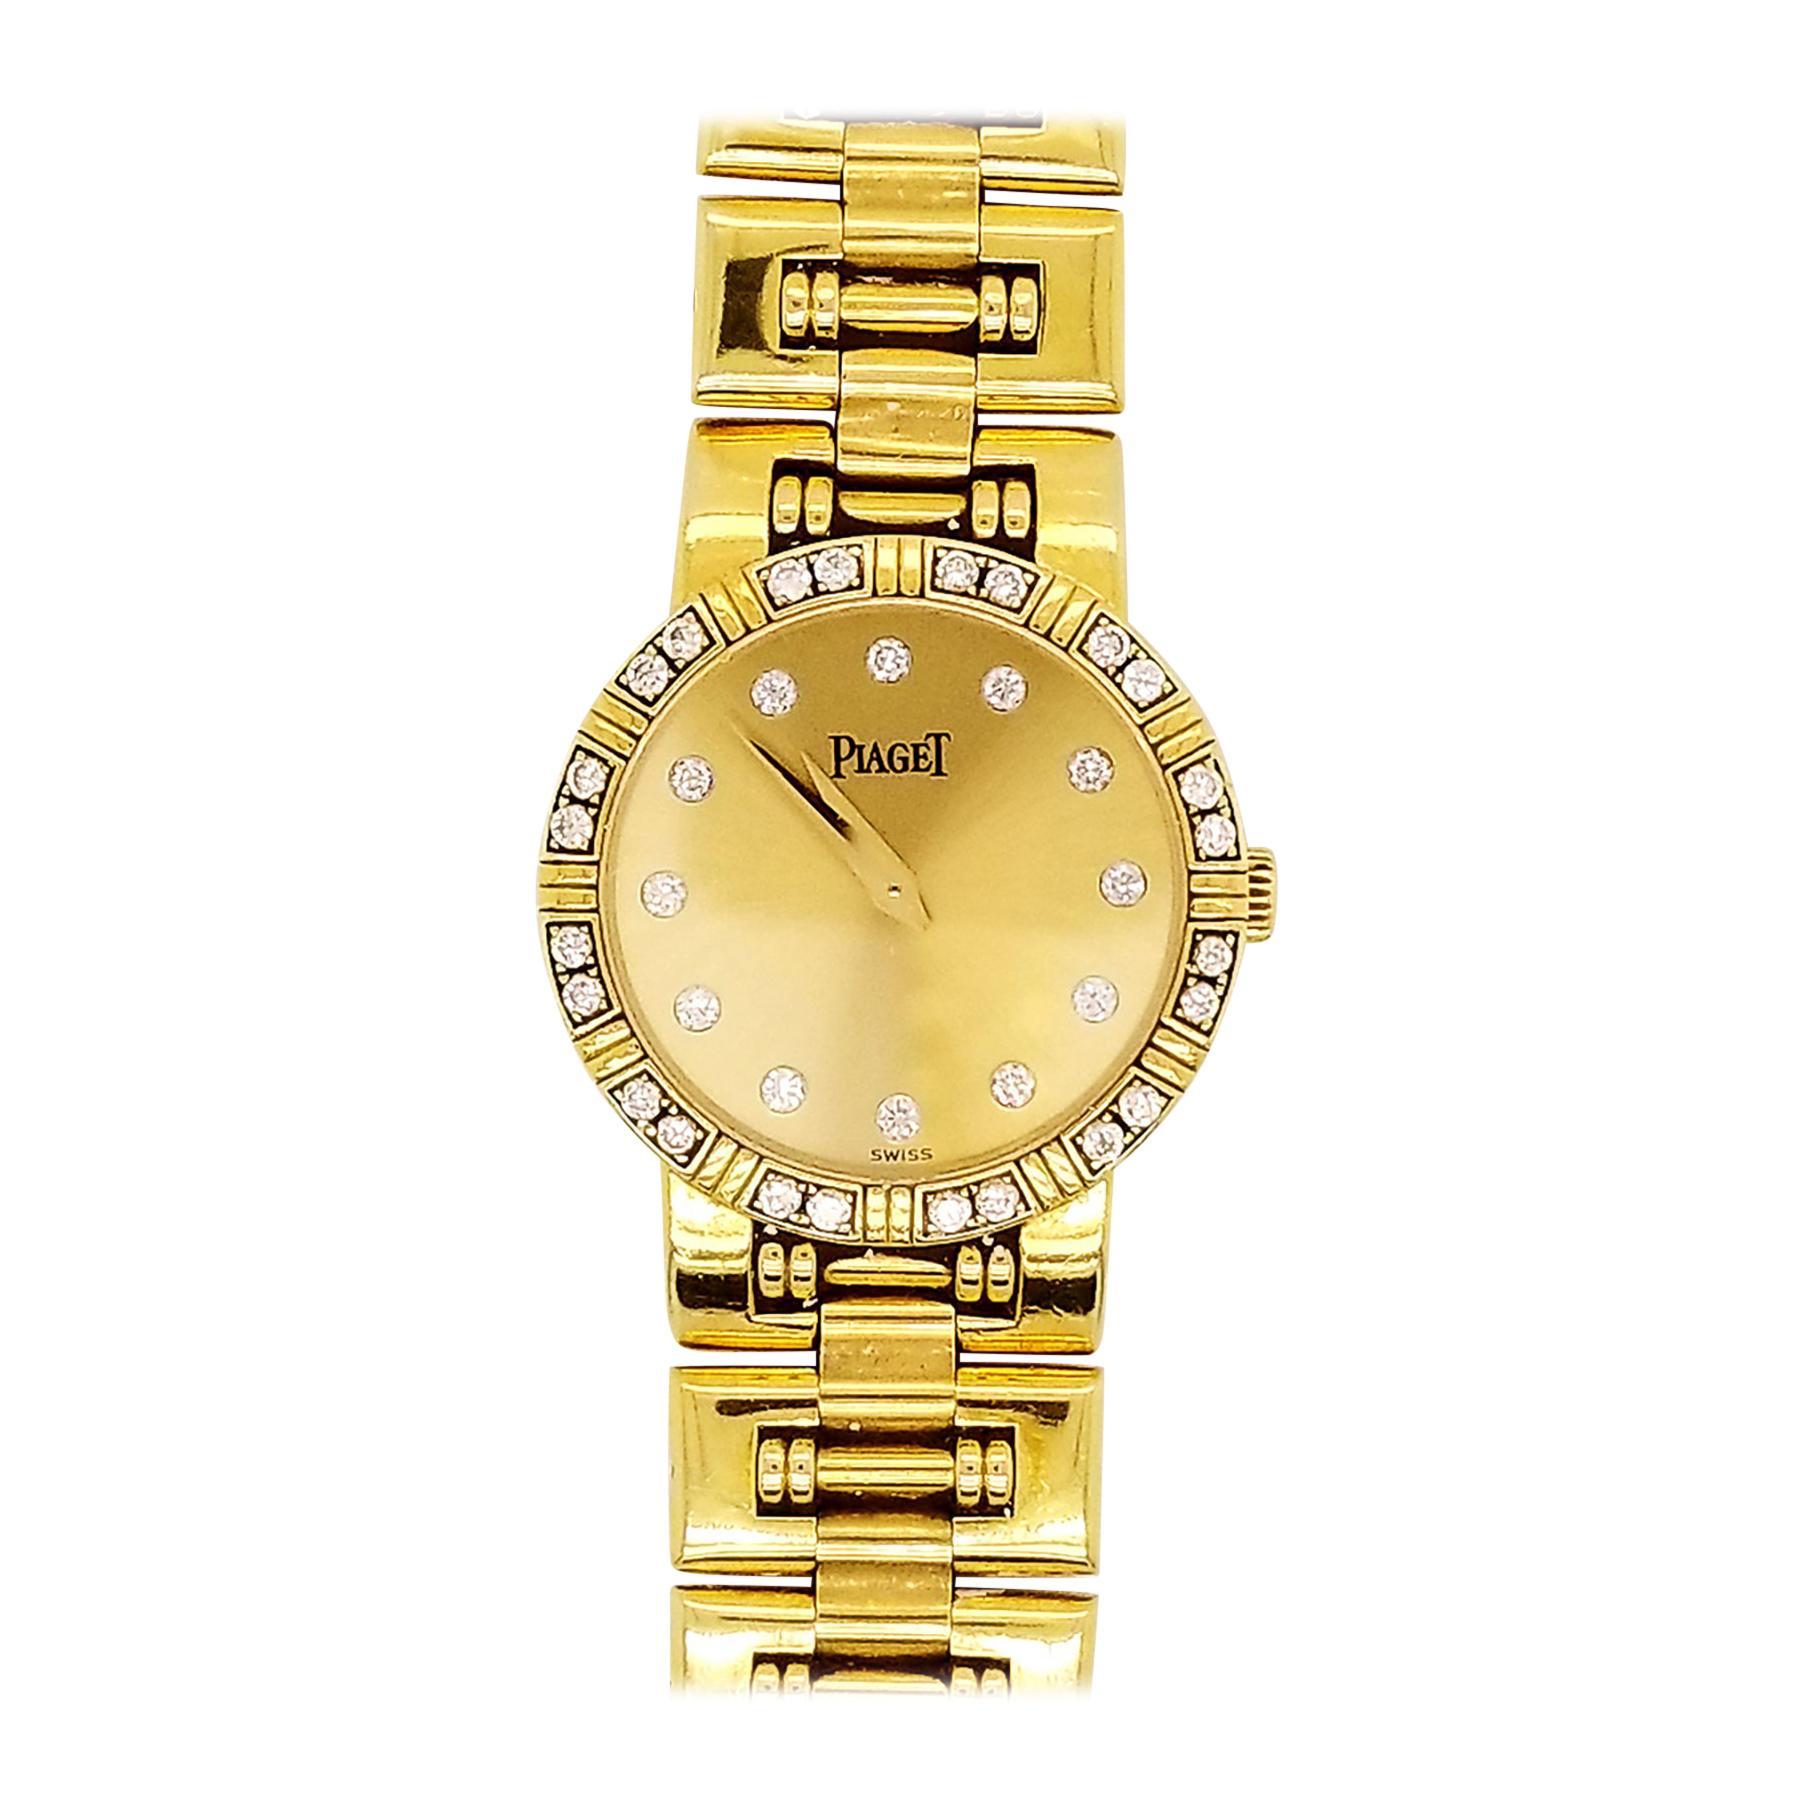 Piaget 18 Karat Yellow Gold Diamond Dancer Women's Wristwatch